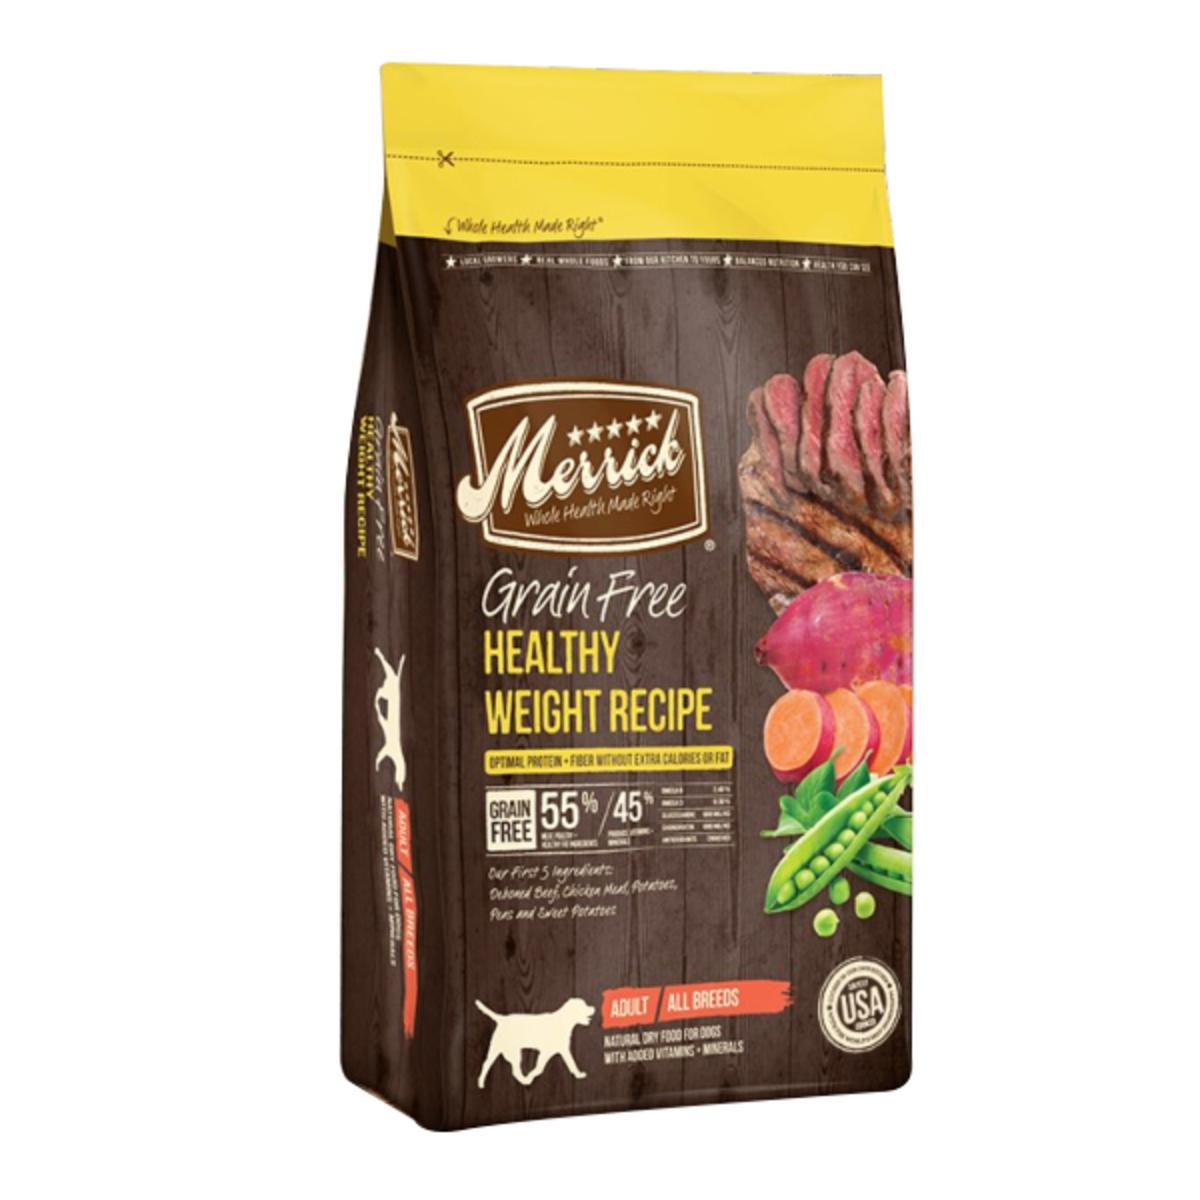 Grain Free Healthy Weight Recipe - 4lb